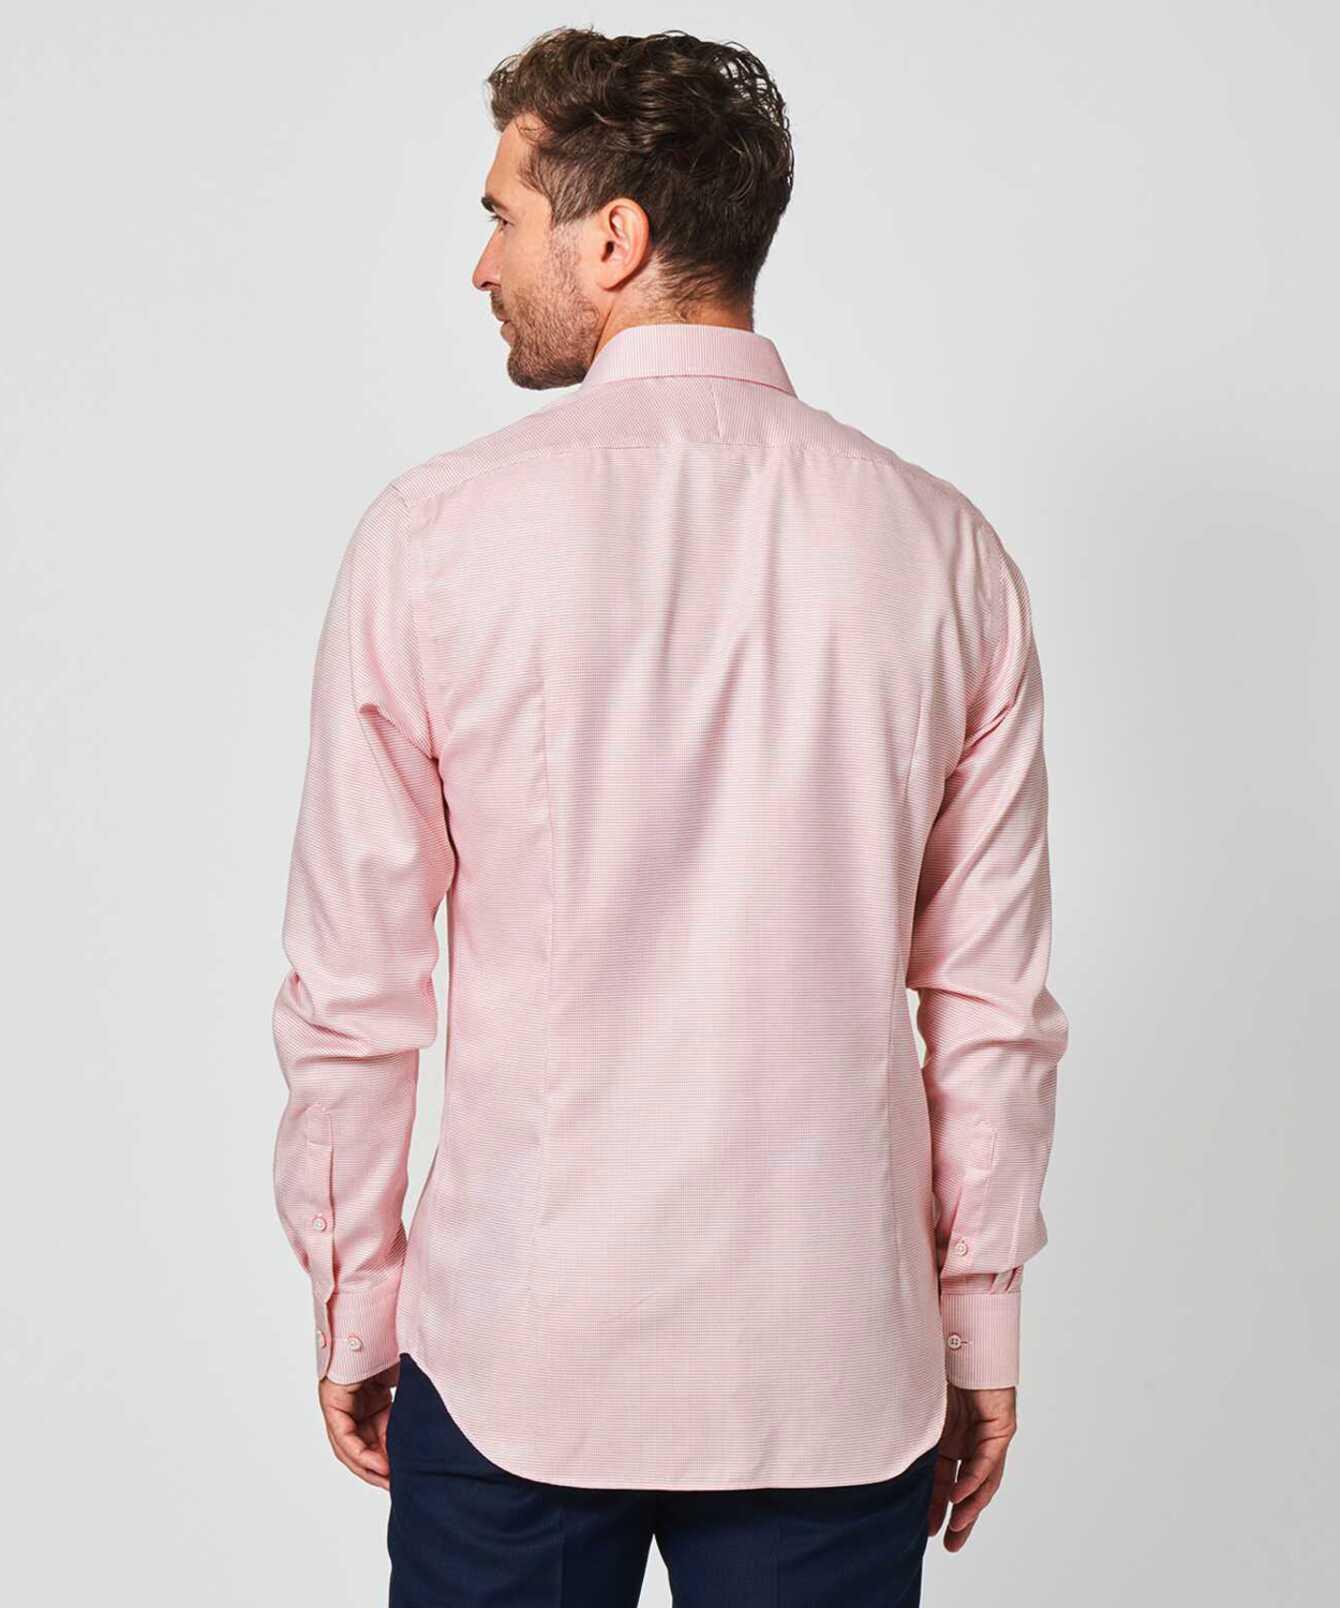 Skjorta Belmont Strykfri Röd Extra Lång Ärm The Shirt Factory